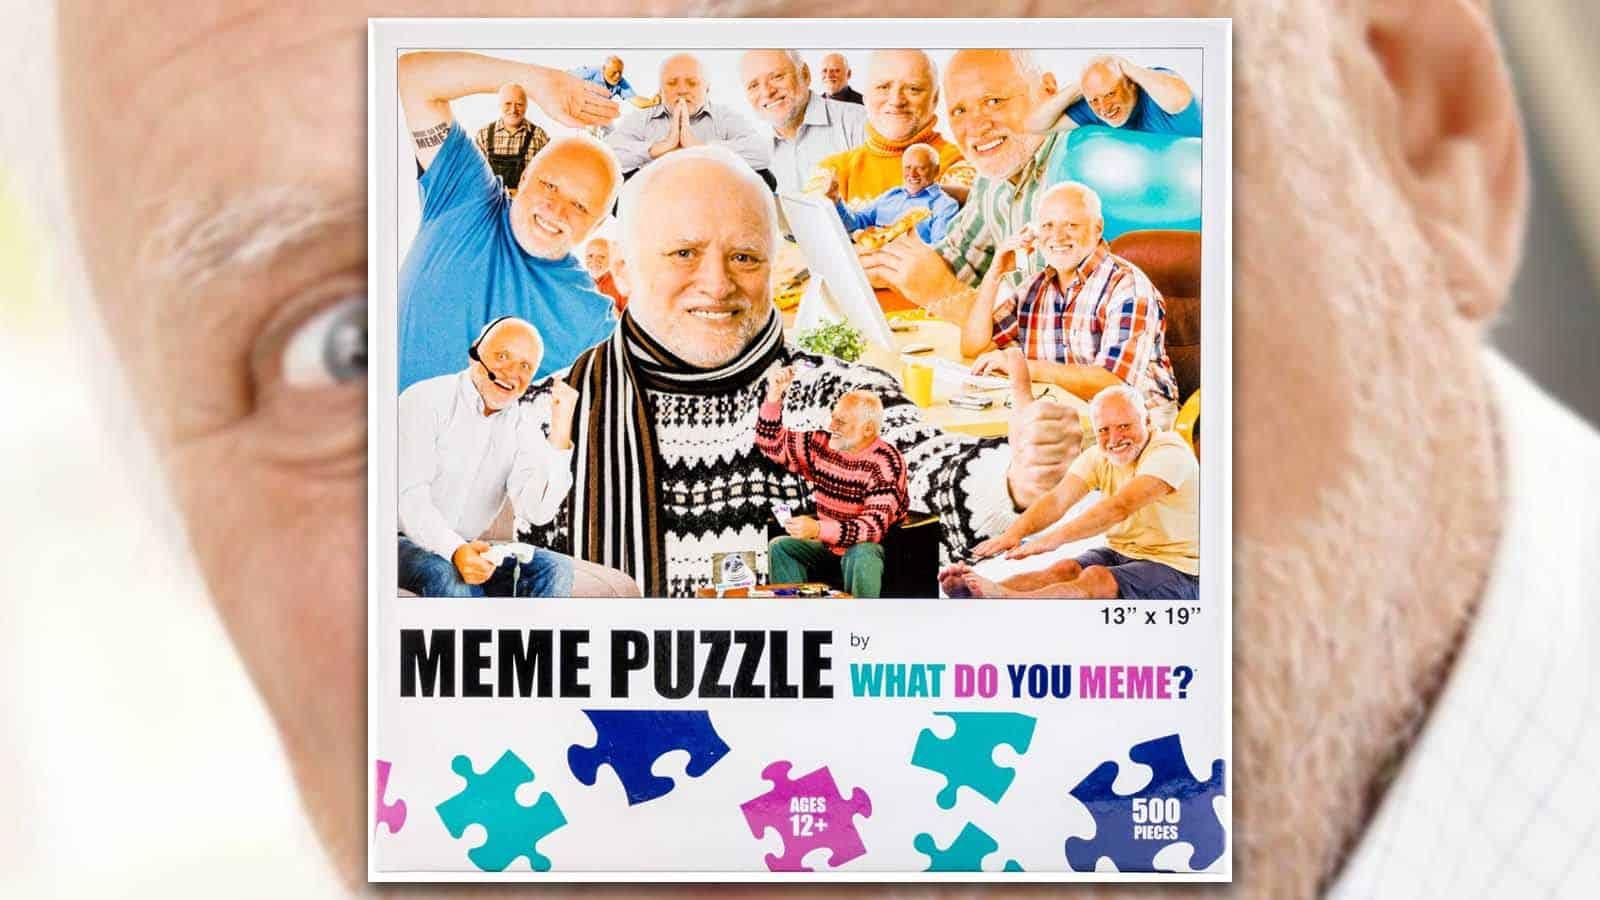 harold meme puzzle